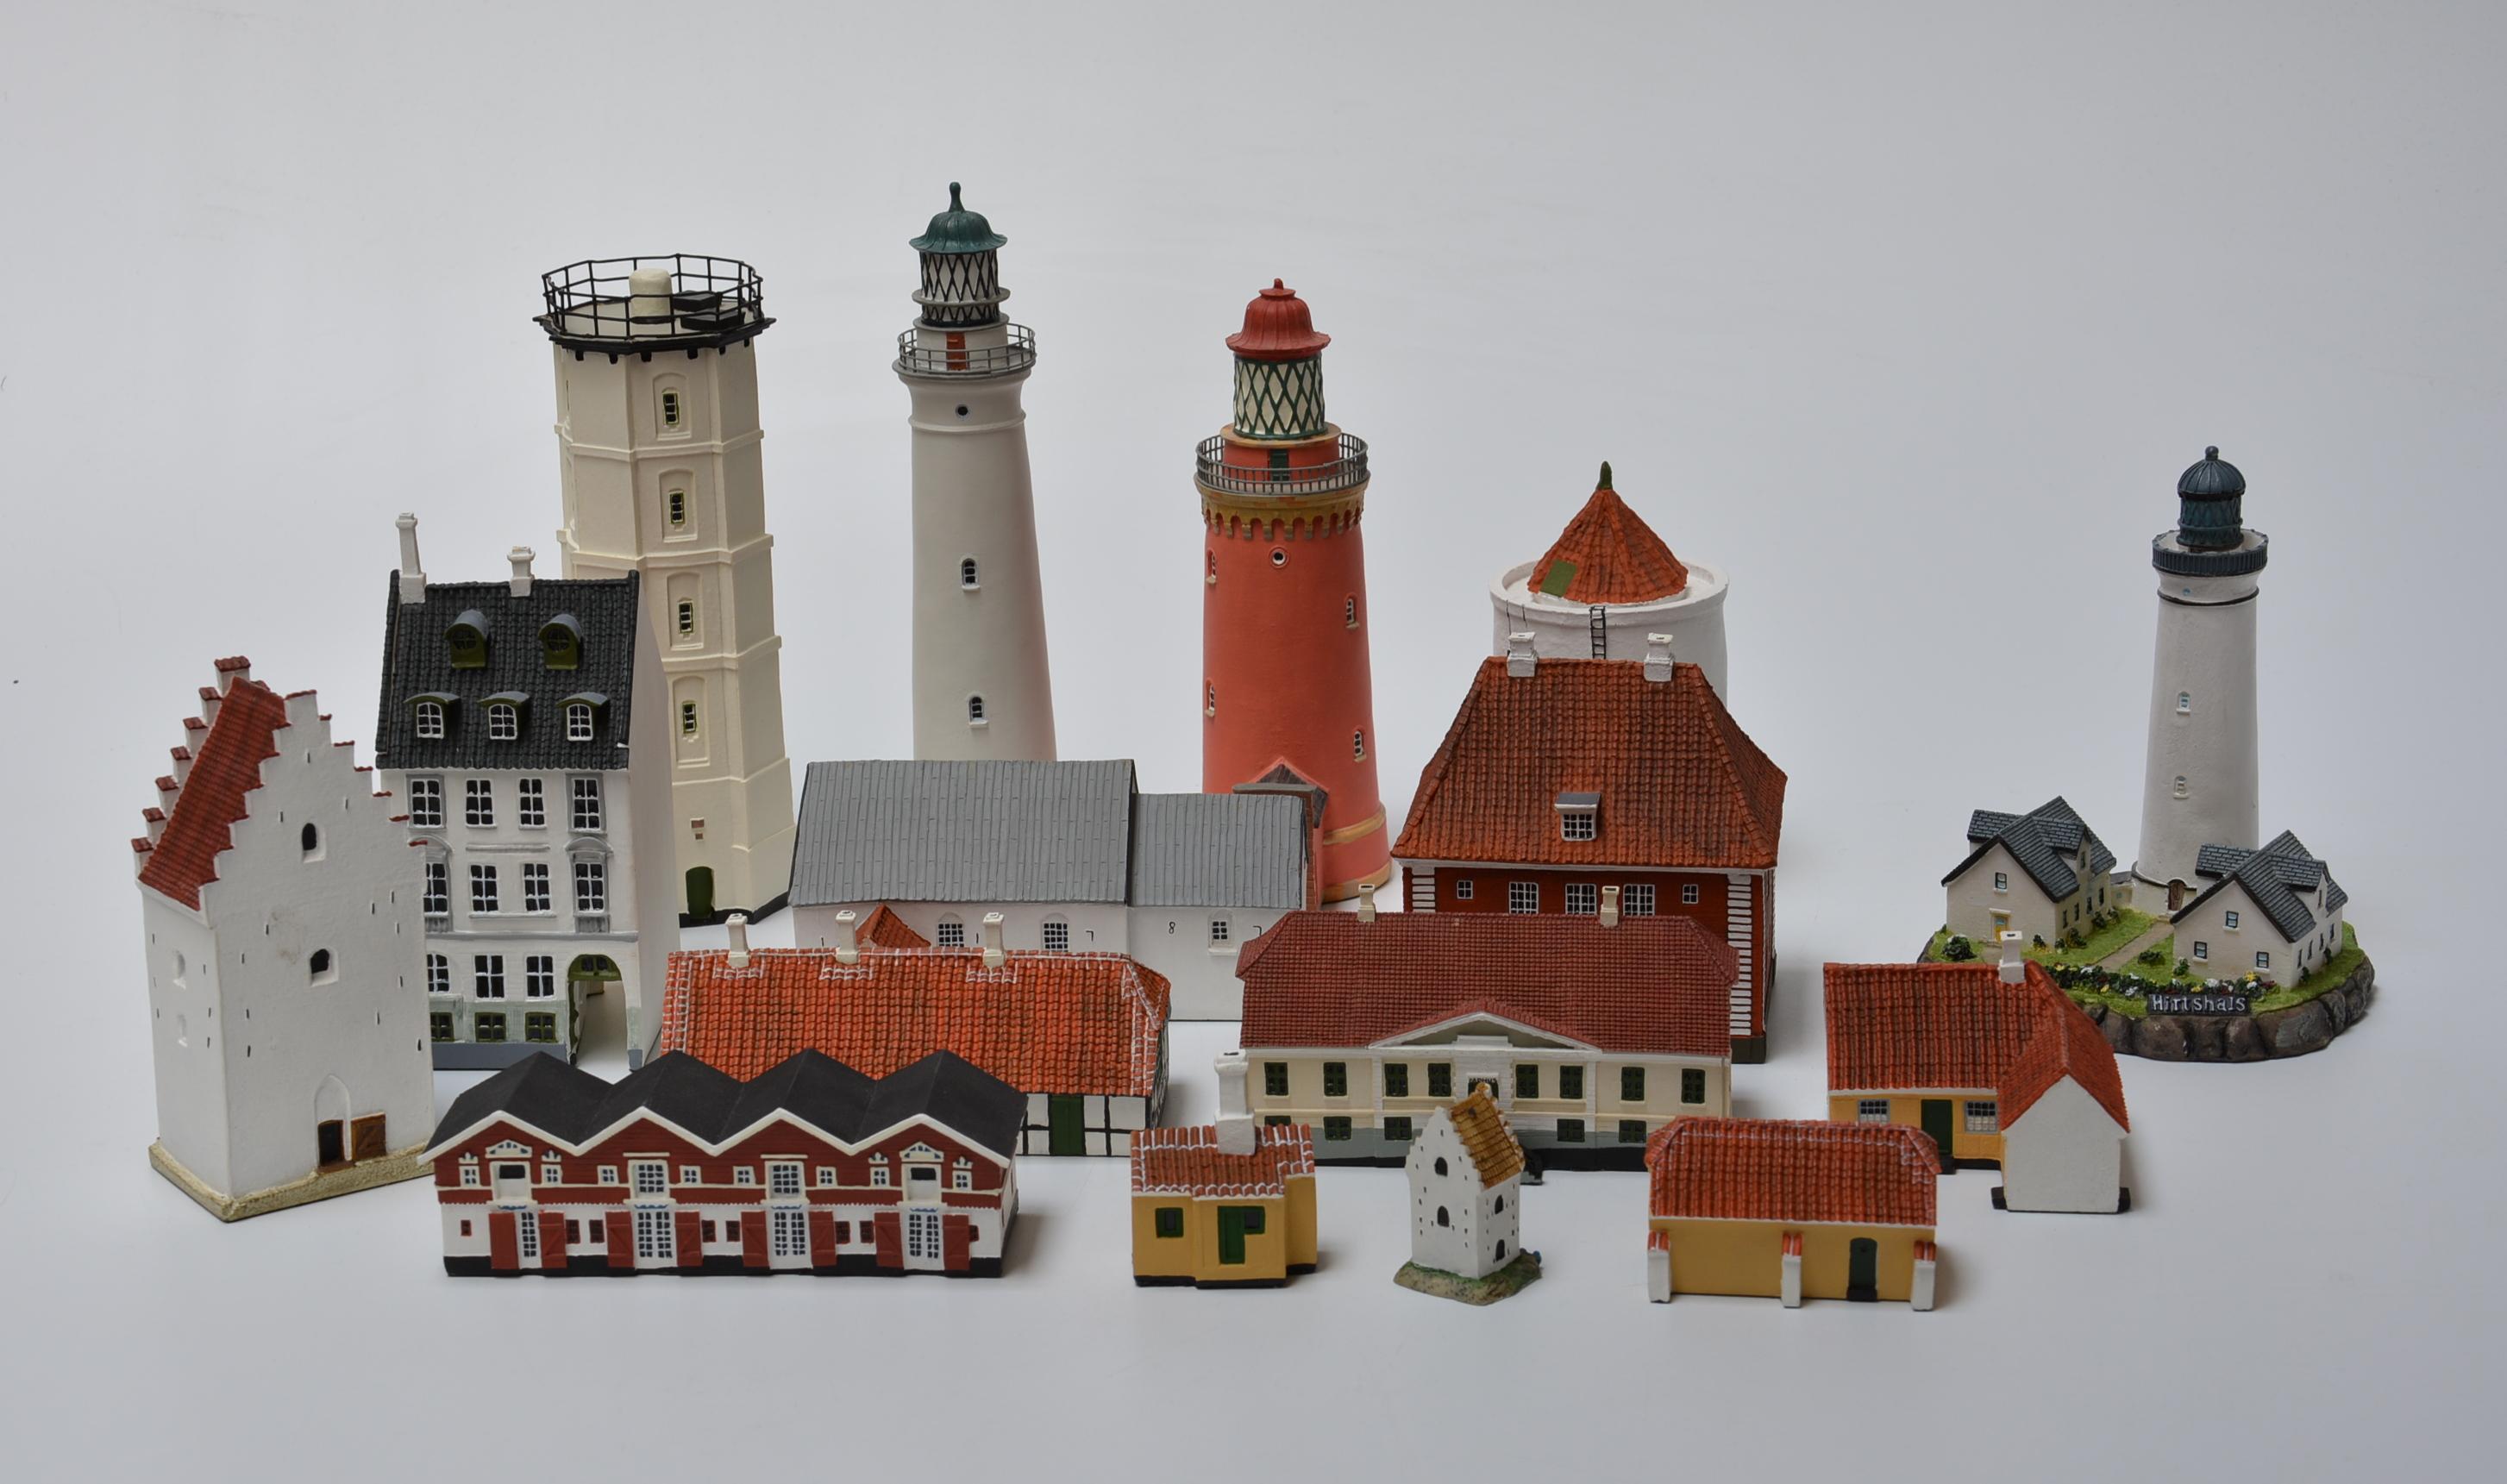 trip trap modelhuse sælges